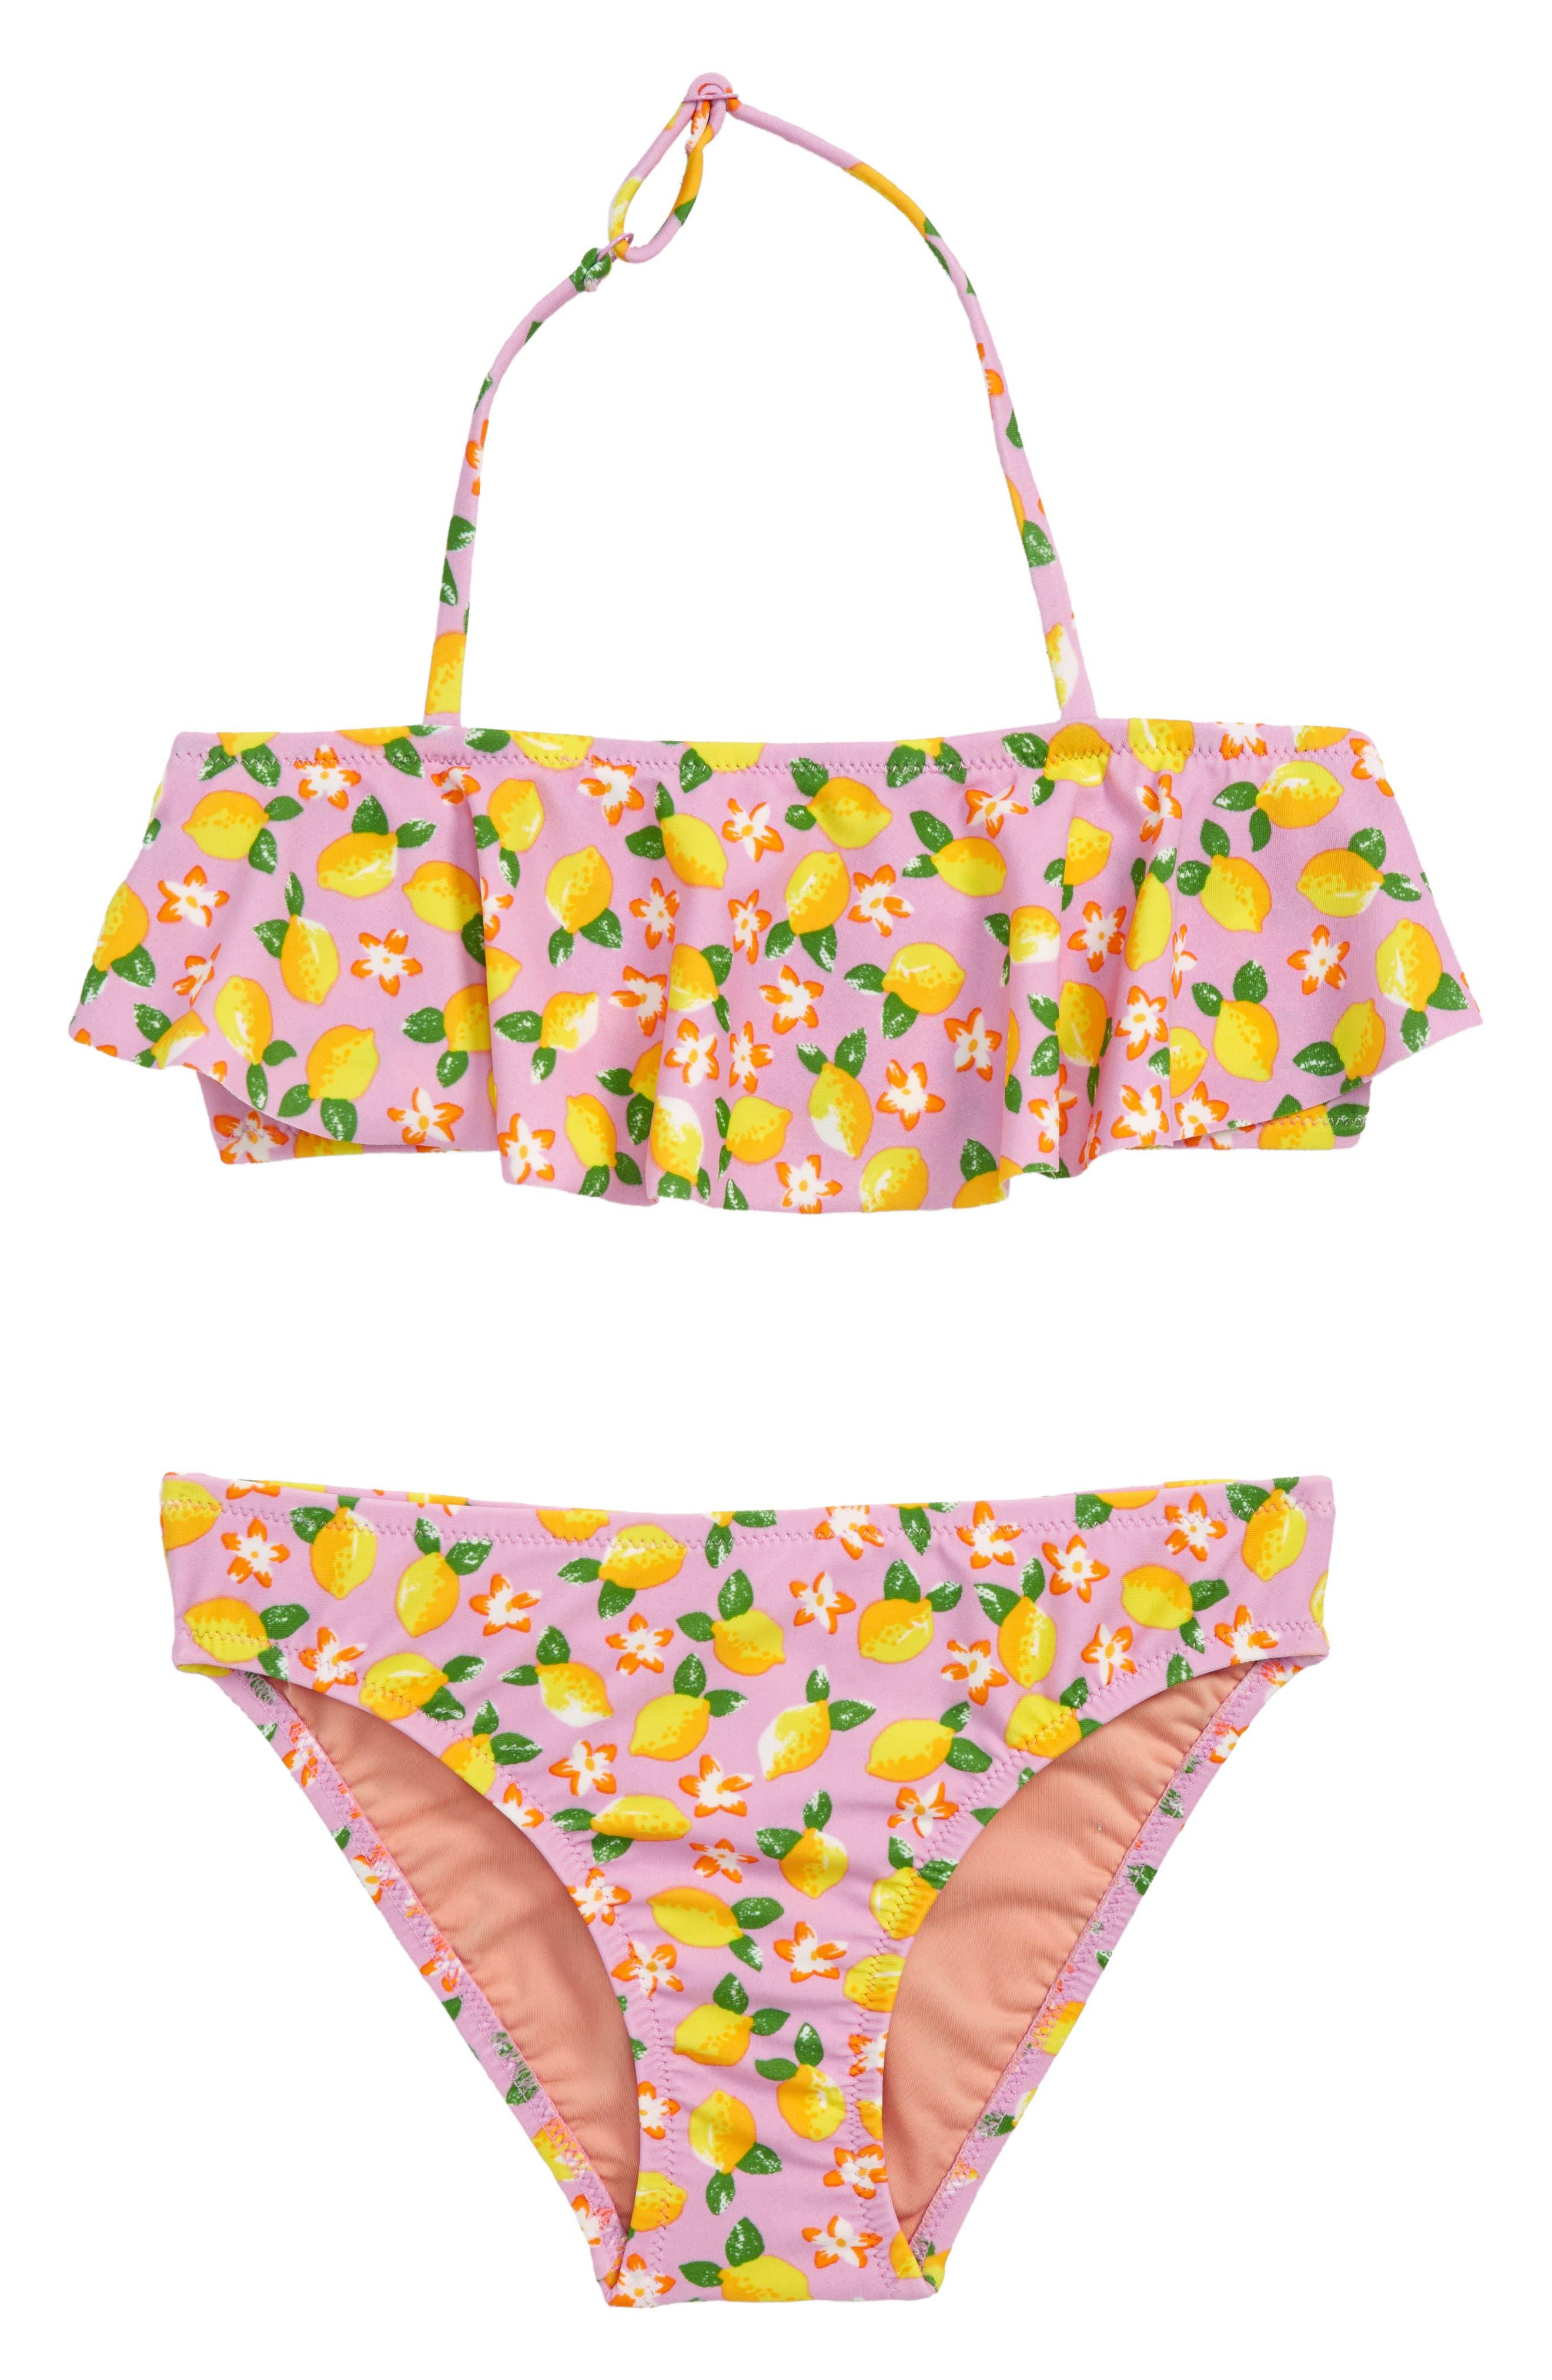 Lemon Print Ruffle Two-Piece Swimsuit,                             Main thumbnail 1, color,                             Lemon Multi